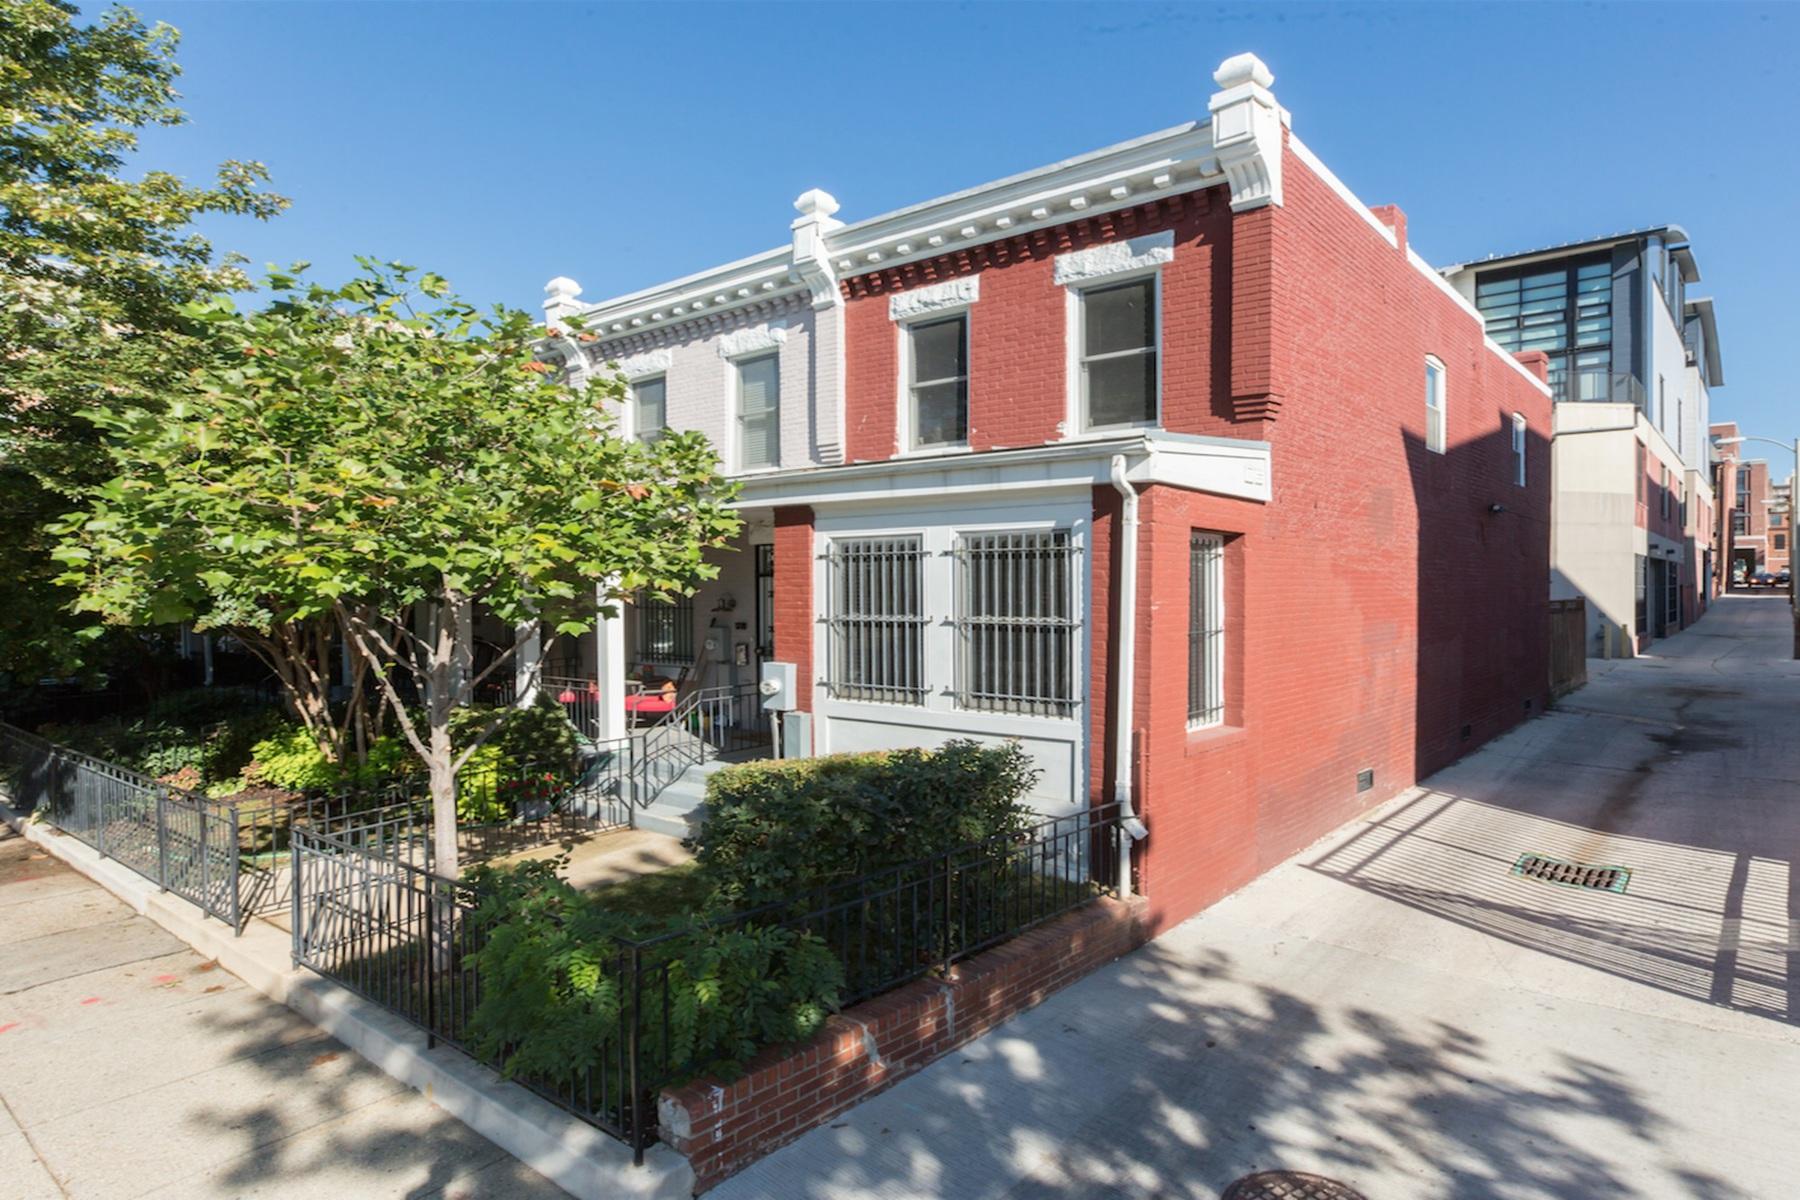 Property For Sale at 1317 V Street Nw, Washington